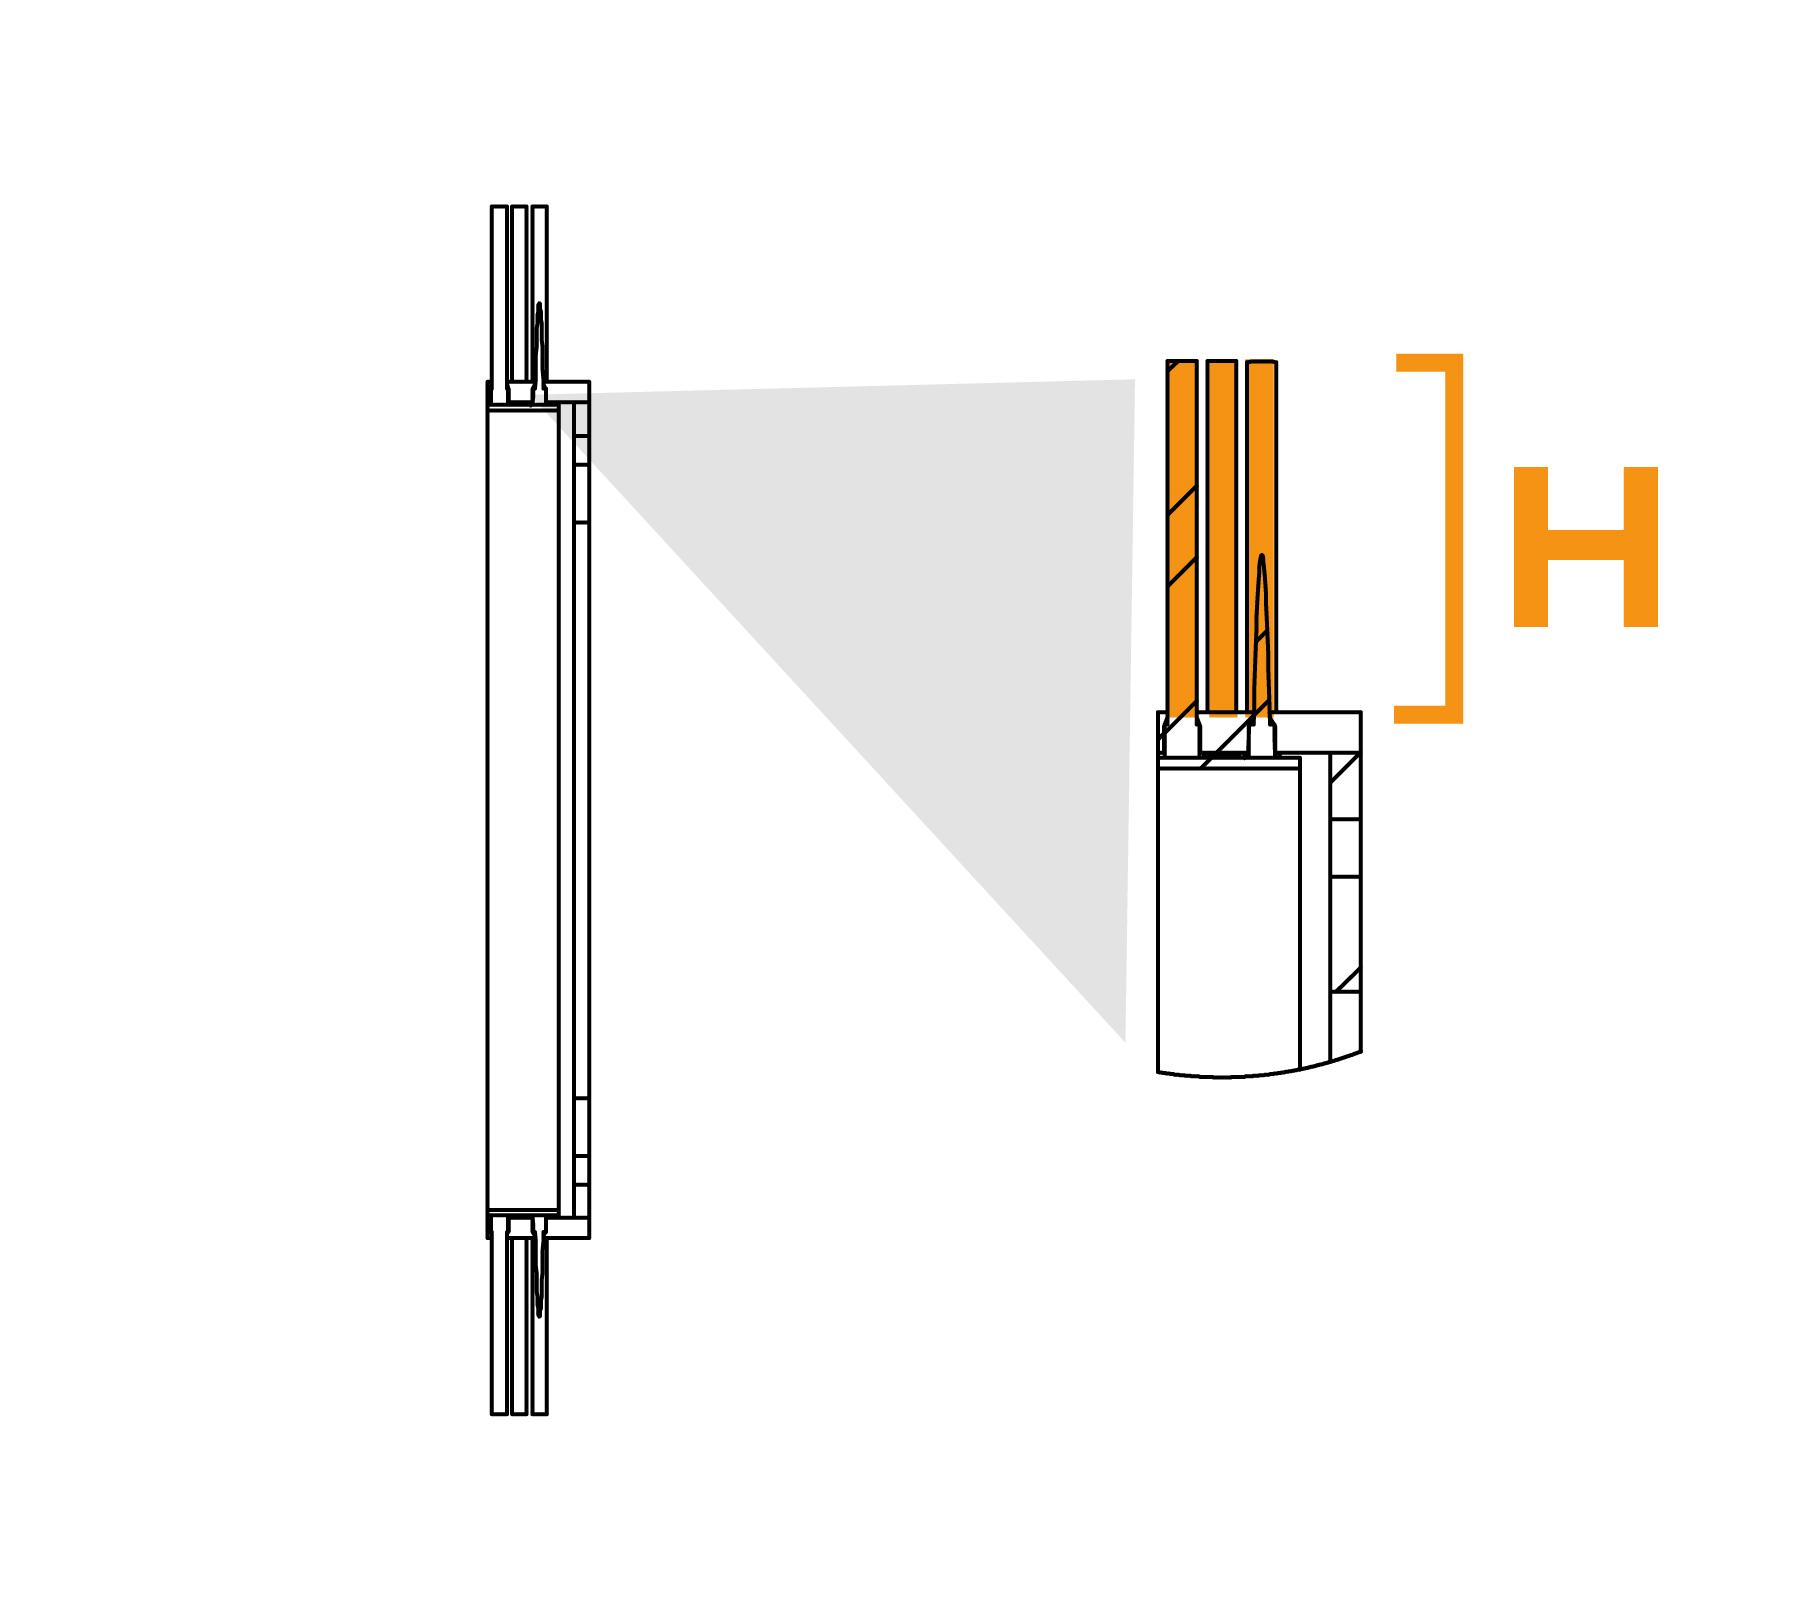 Potloodringborstel met grote diameter - diagram H